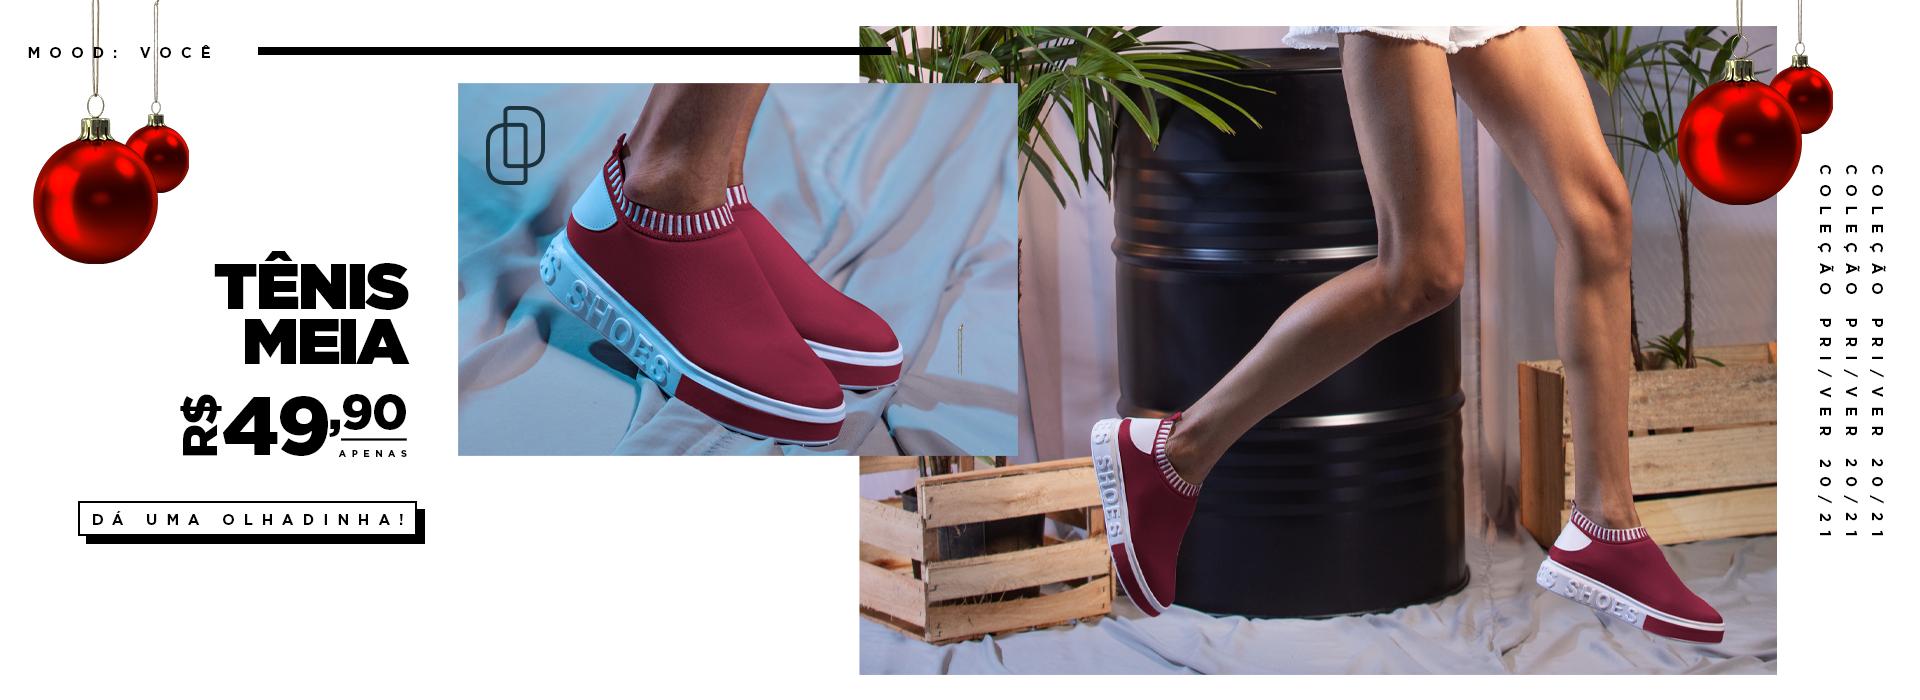 Tênis meia it shoes